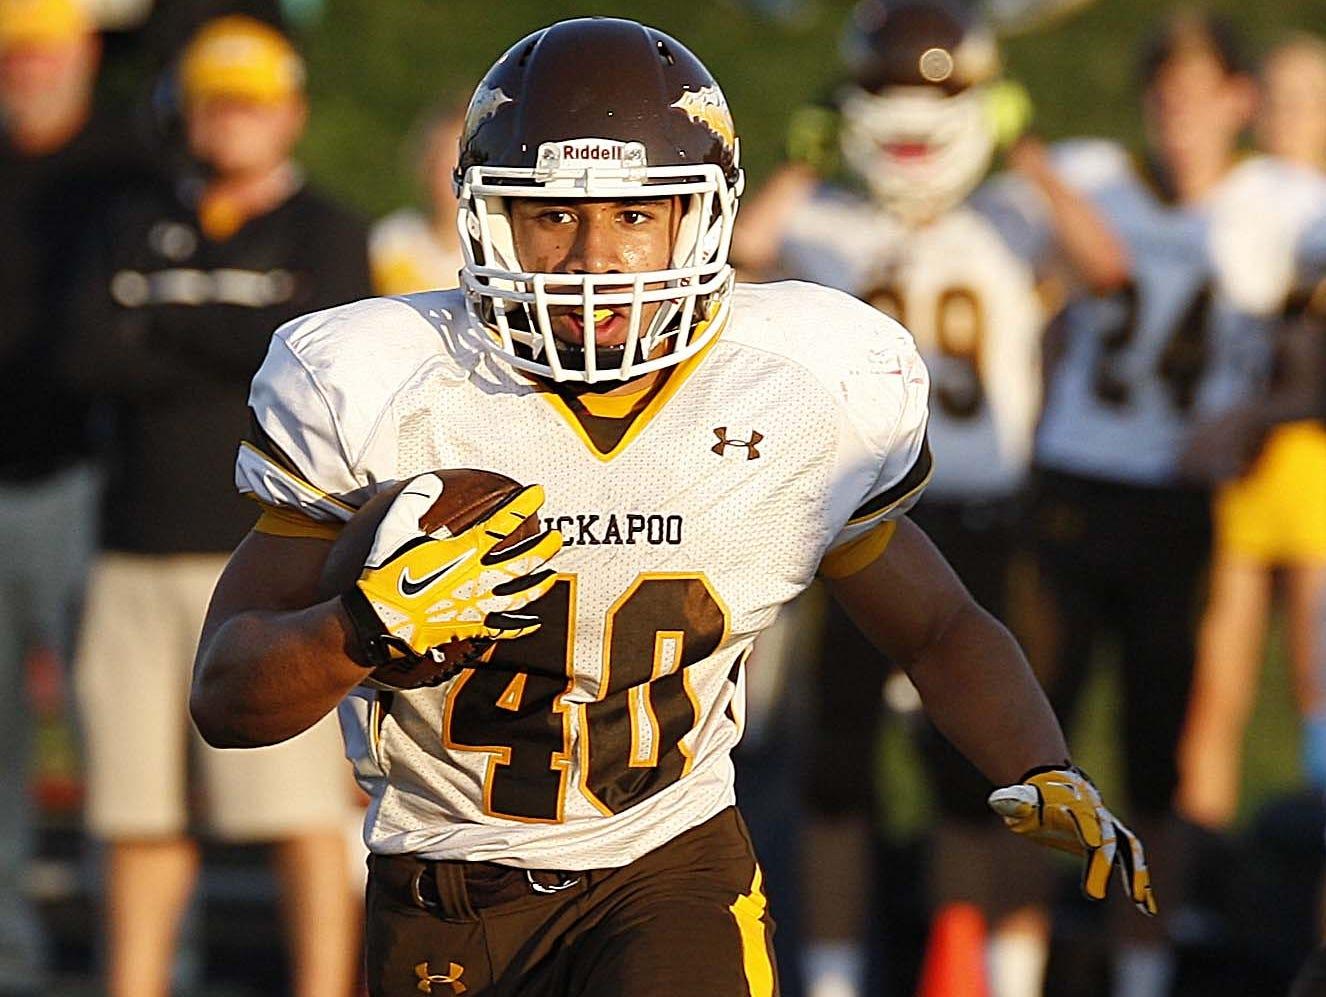 Kickapoo's Malachi Stout scored six touchdowns in a 49-21 win at Lebanon